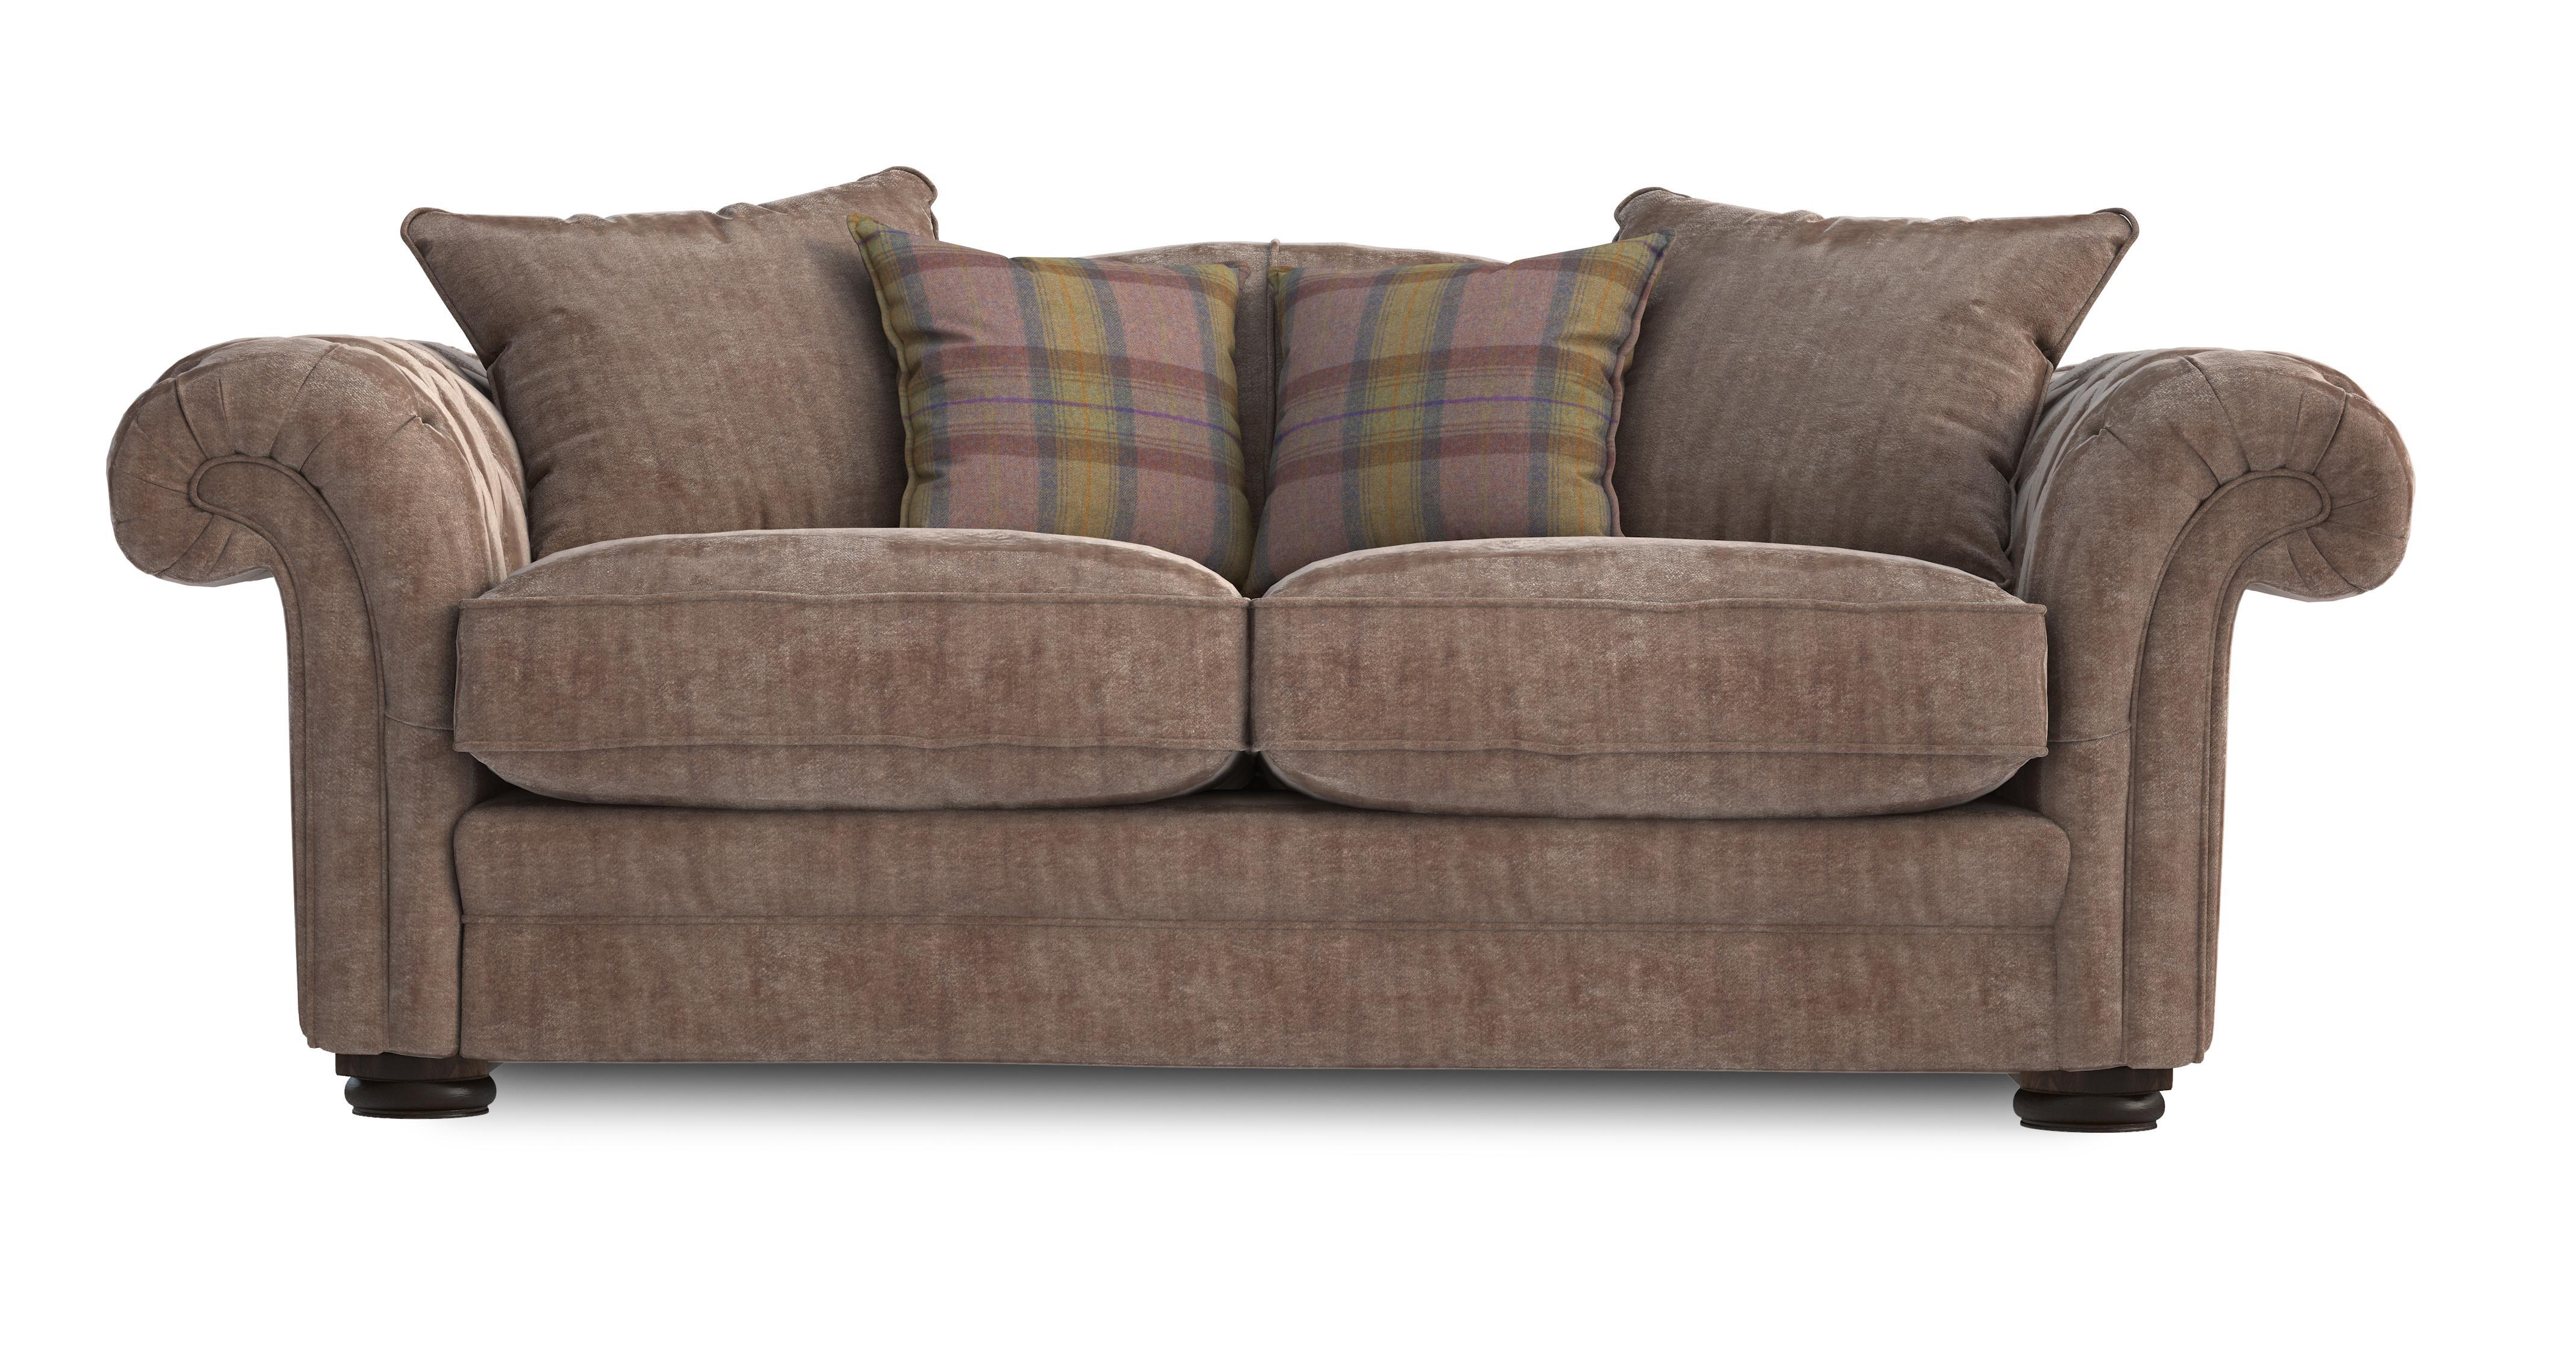 big pillows for sofas modulares roche bobois precios loch leven large pillow back sofa dfs